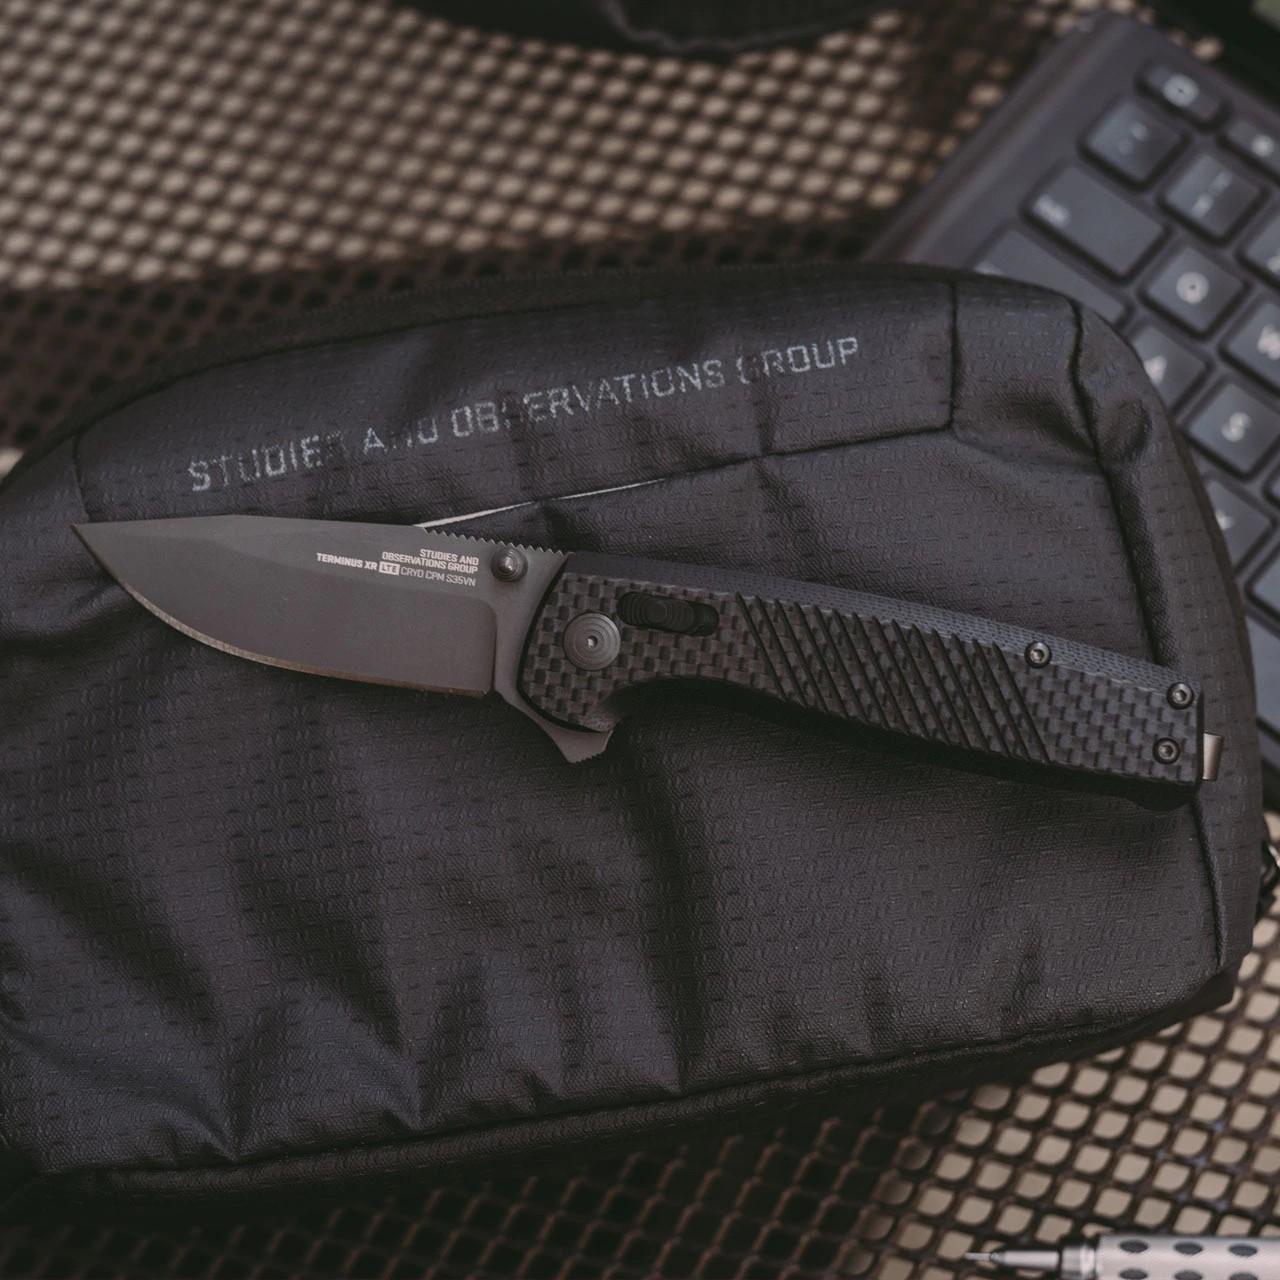 sog knives terminus lte folder knife pocket knife cpm s35vn blade